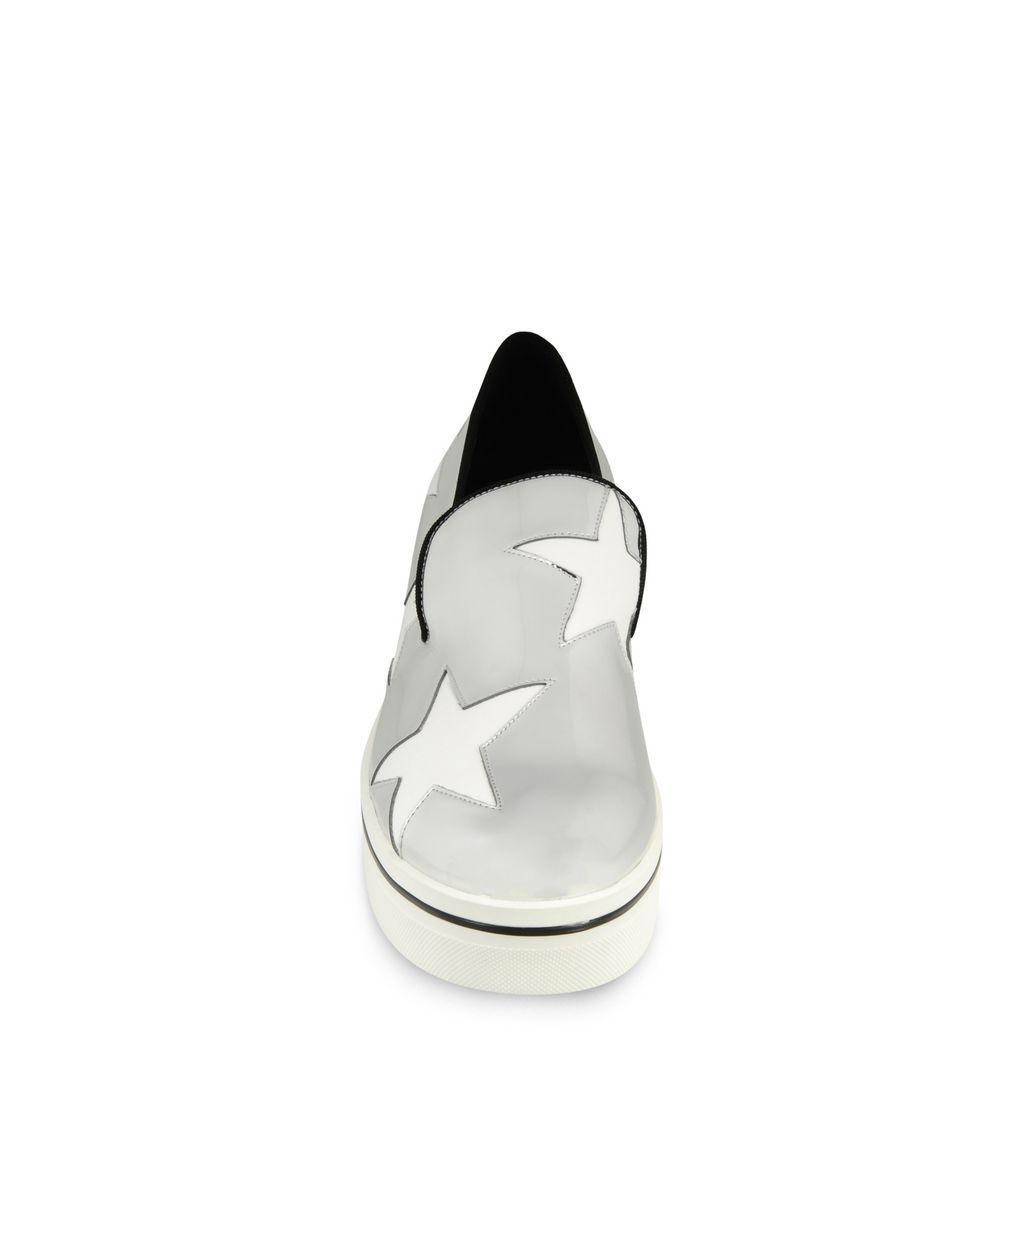 Star Binx Loafers - STELLA MCCARTNEY